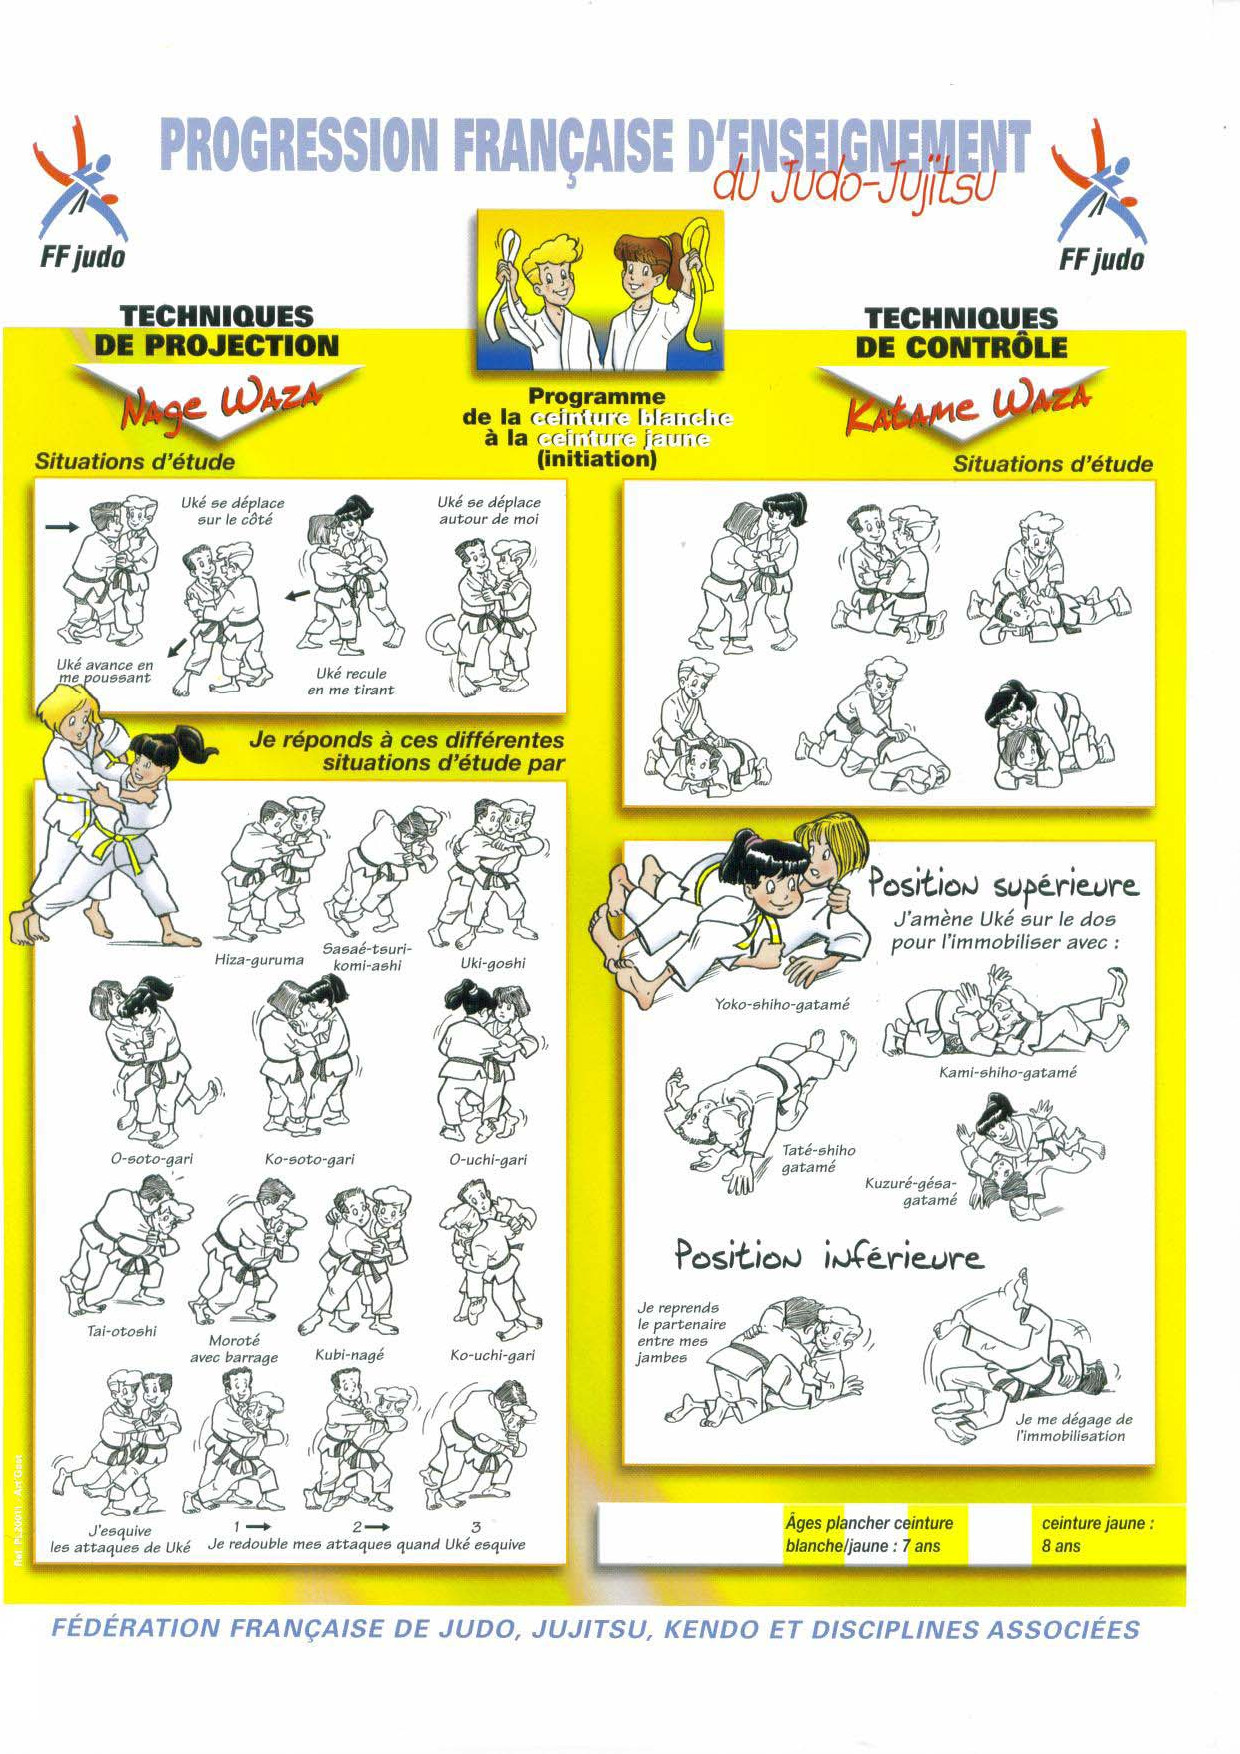 14a86a70c5f8 ceinture jaune jujitsu,livret ceinture blanche a jaune double